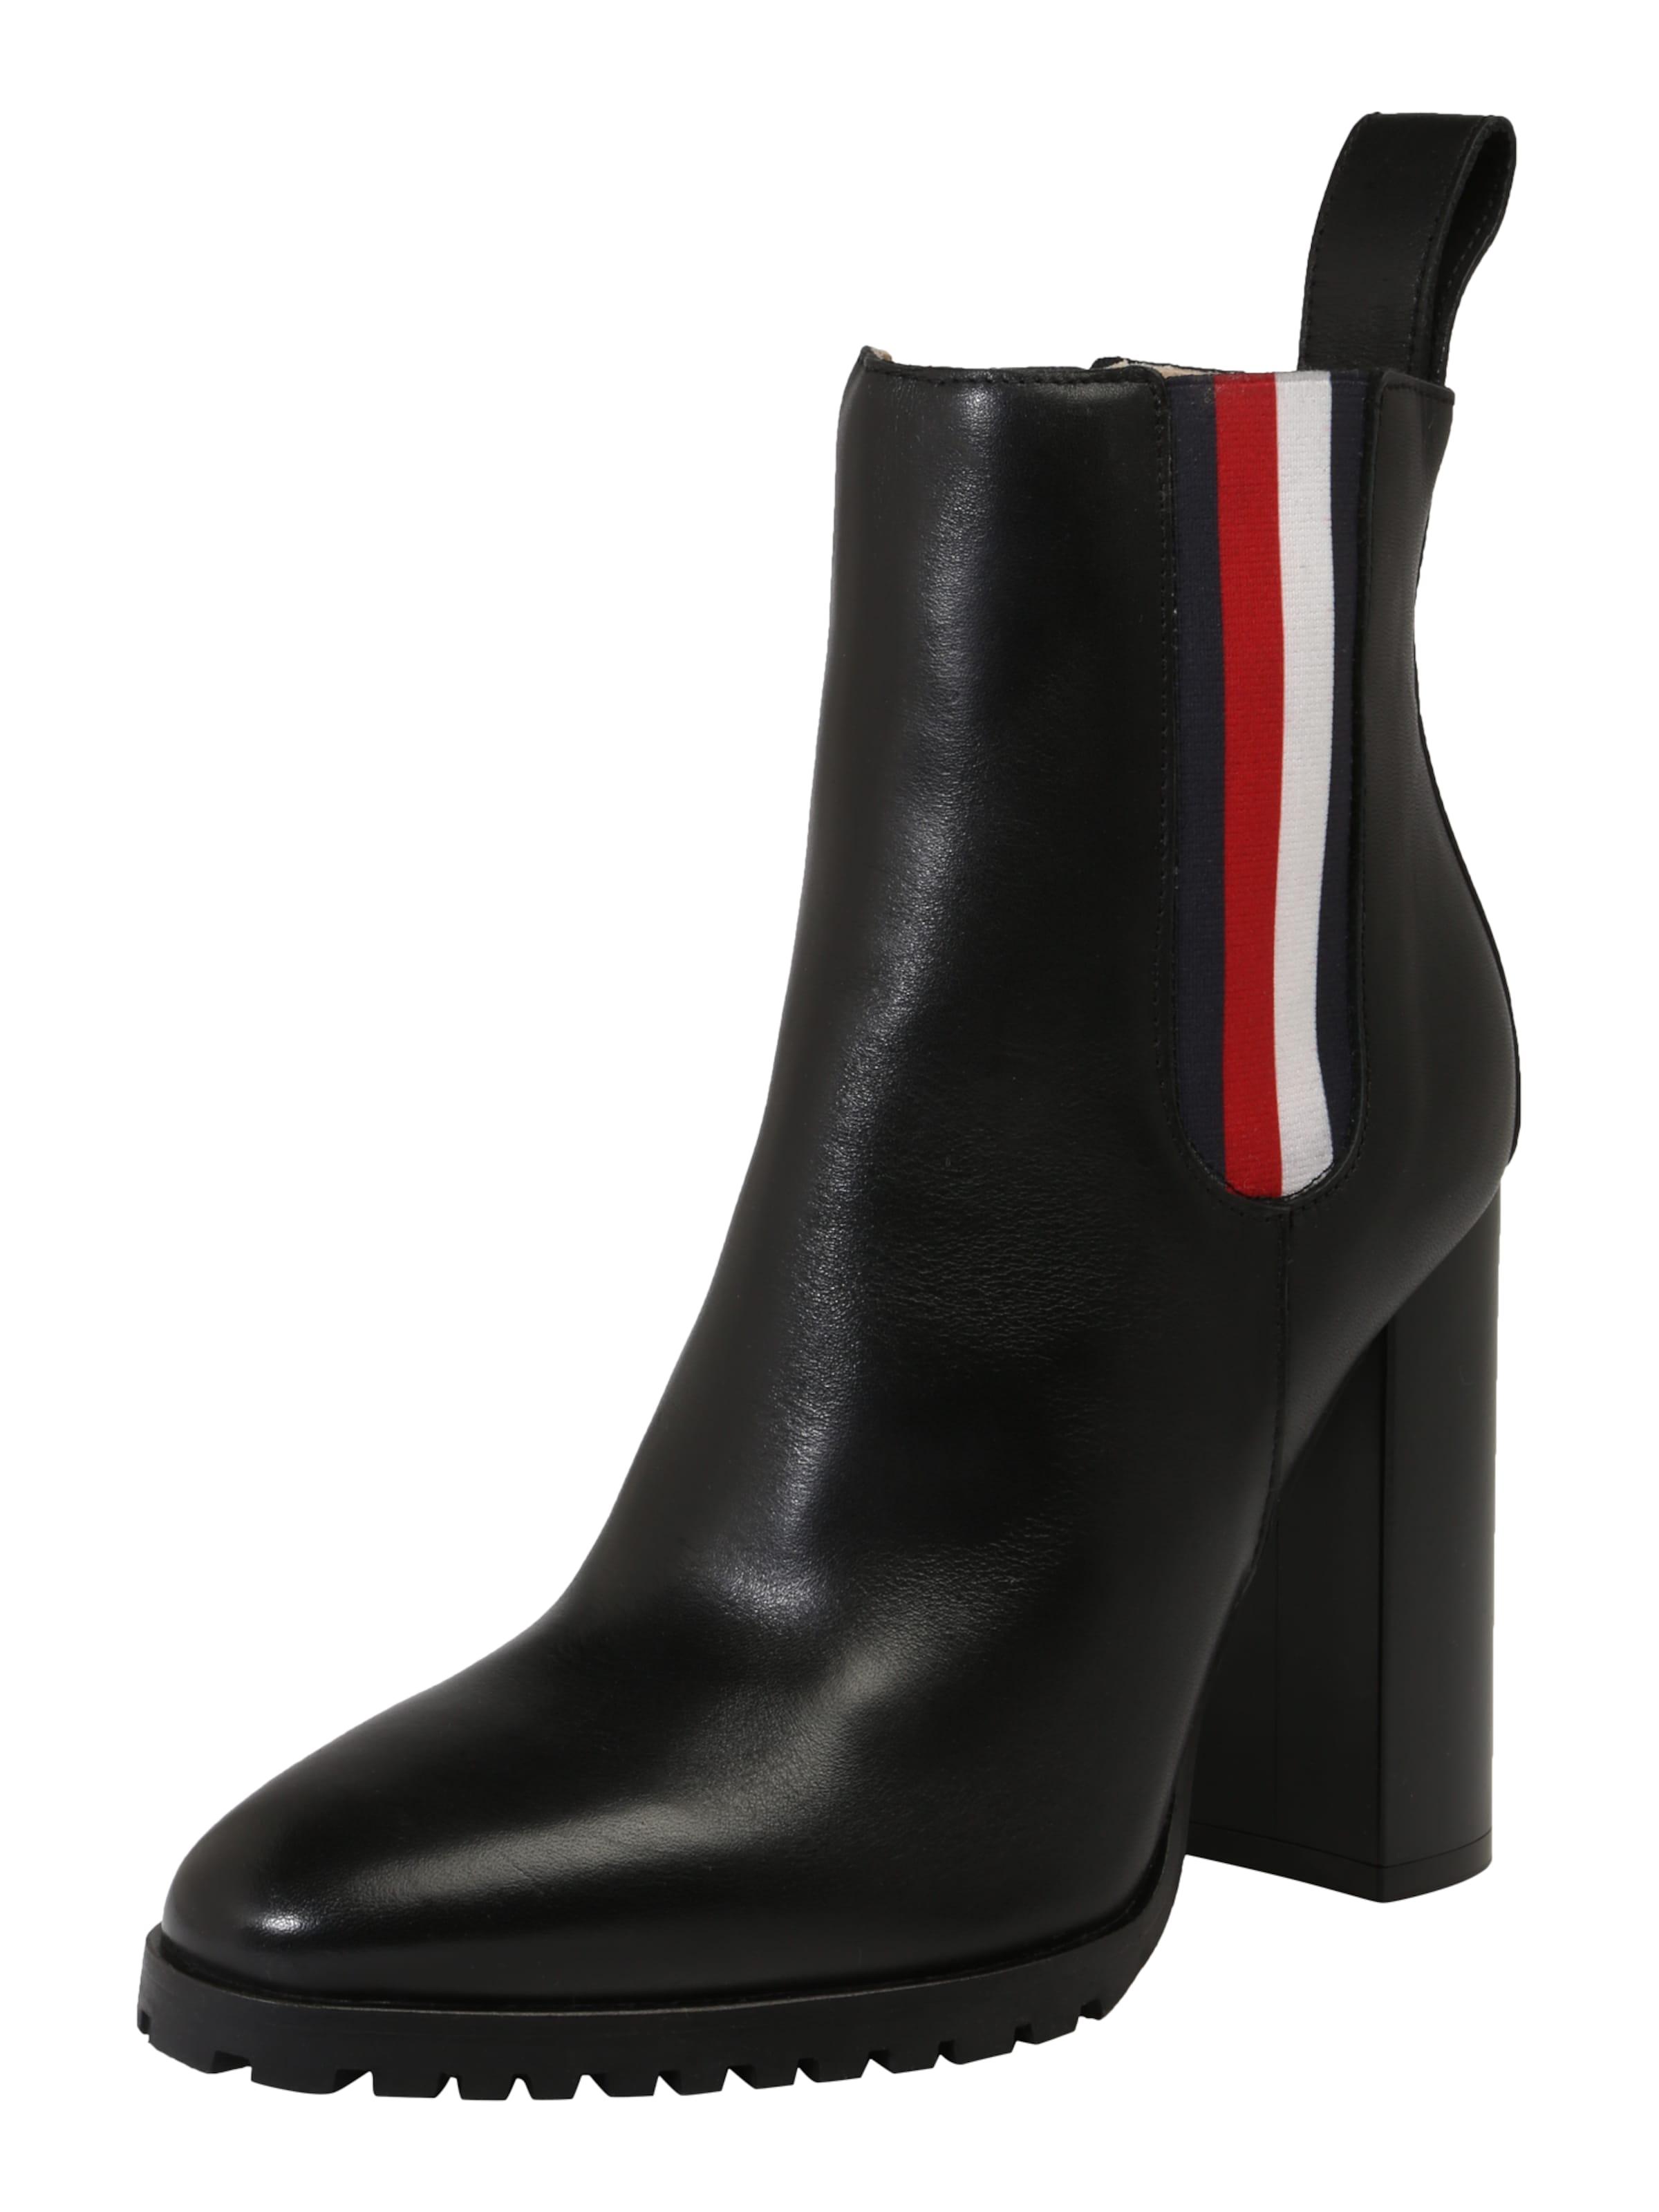 TOMMY HILFIGER | Chelsea-Boot THxGH 'GIGI HADID' Schuhe Gut getragene Schuhe